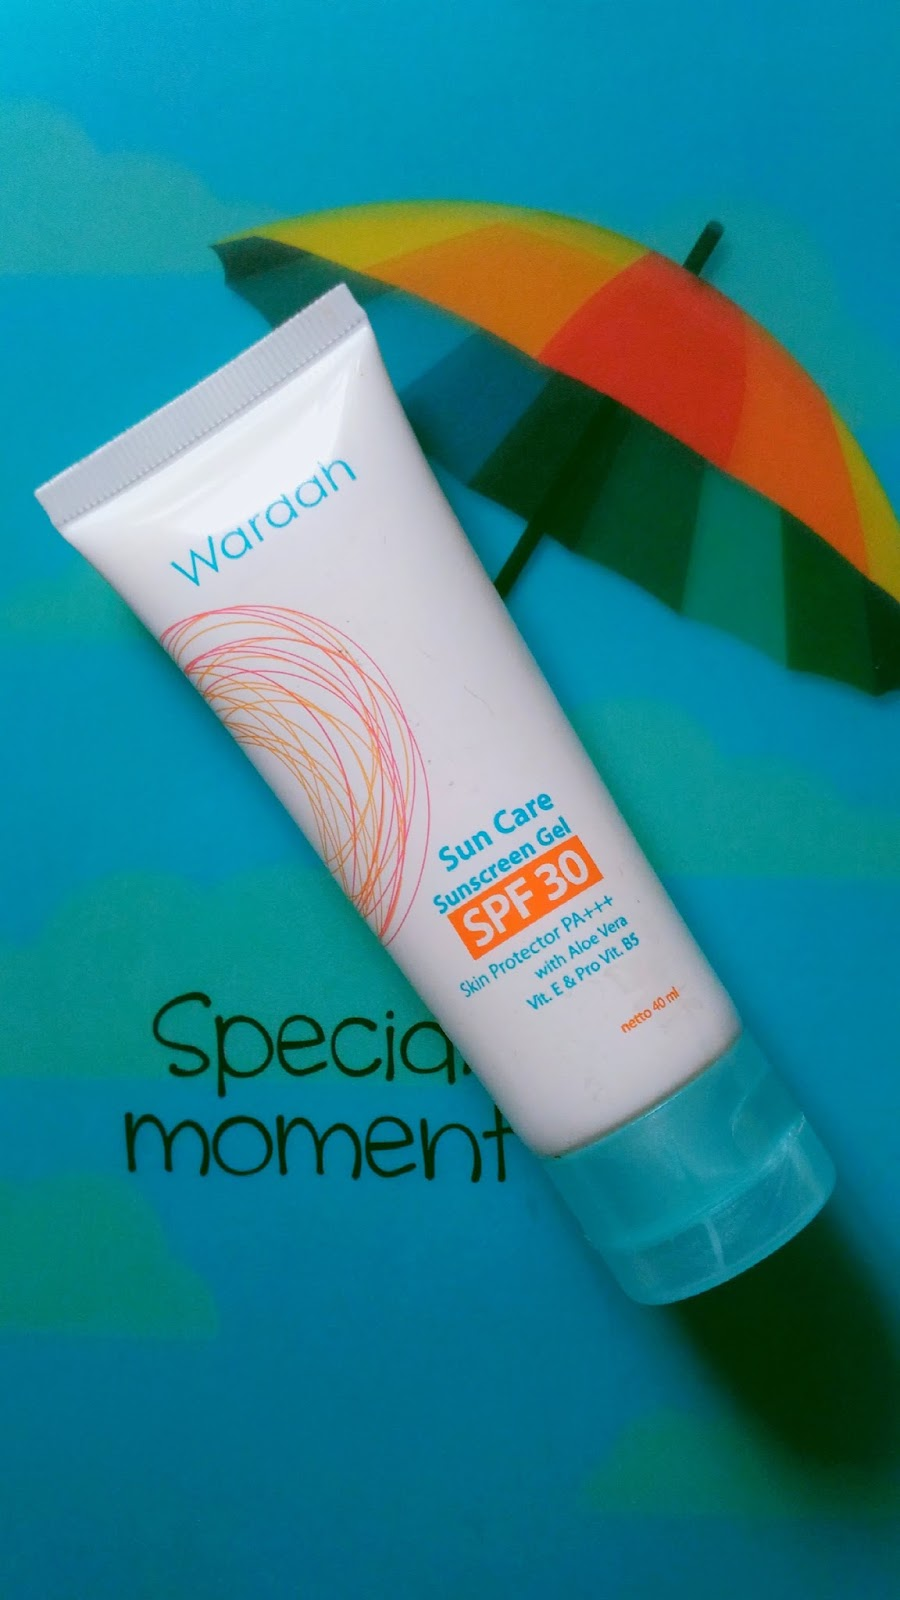 Review Wardah Sunscreen Gel : review, wardah, sunscreen, QUICK, REVIEW, Wardah, Sunscreen, PA+++, Yulistinay's, Diary